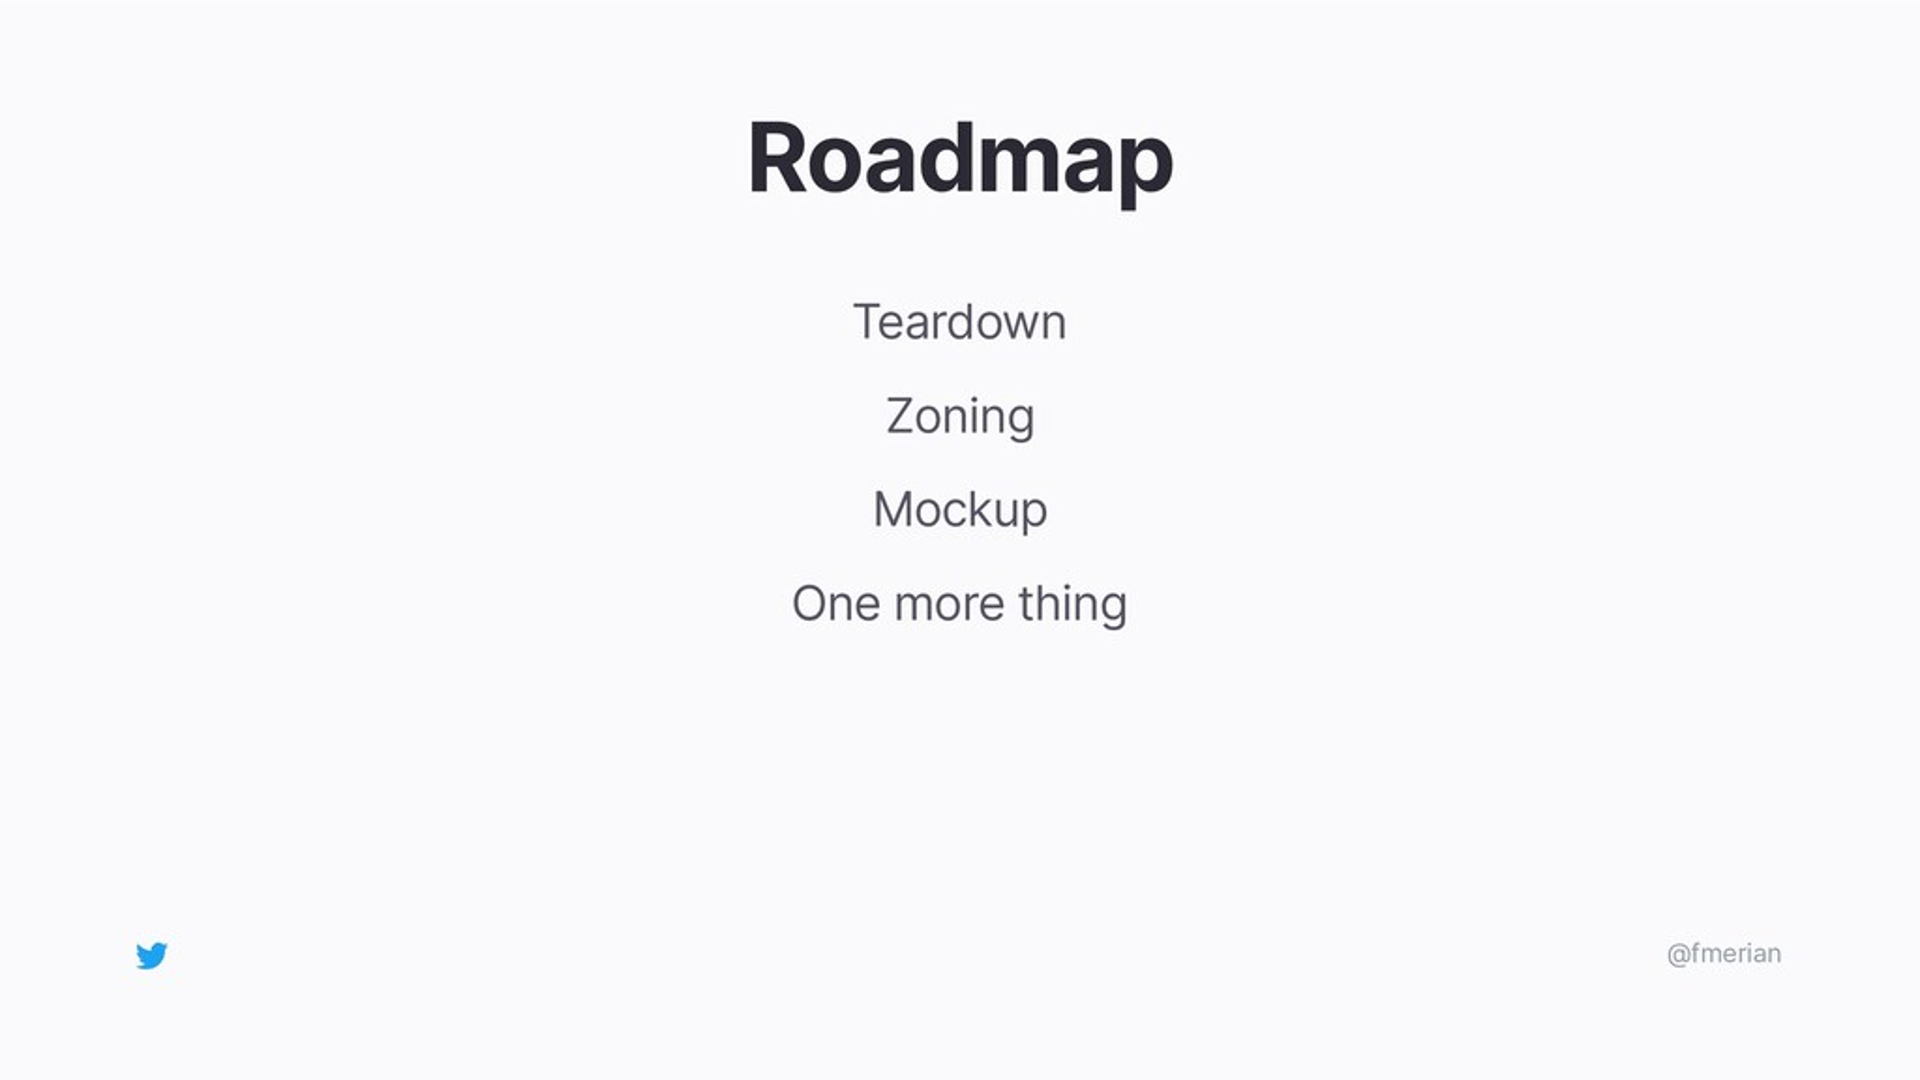 Roadmap Teardown Zoning Mockup One more thing @...